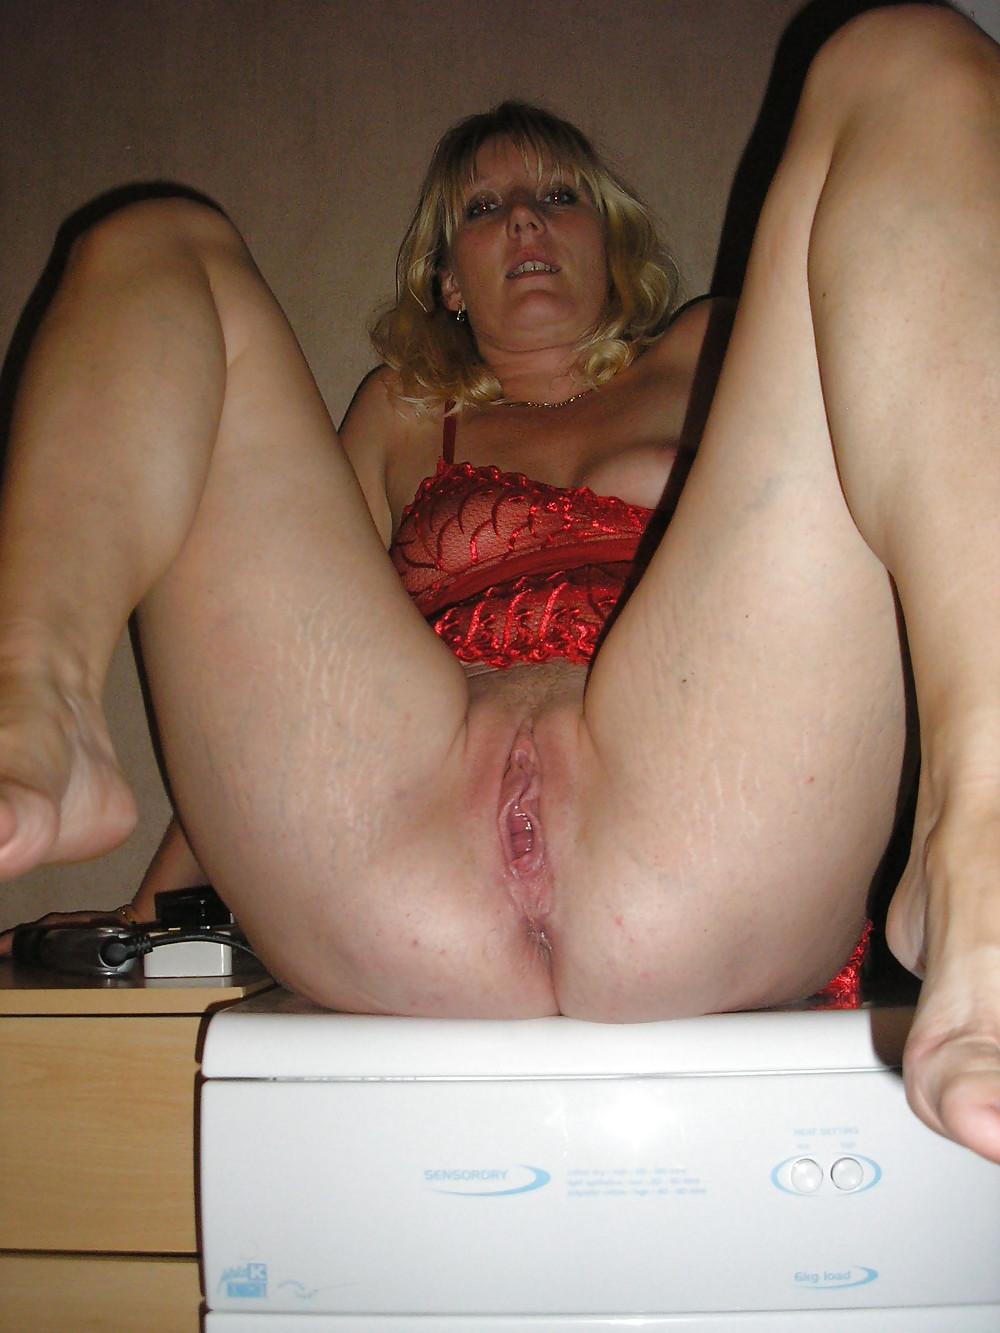 MILF blonde woman panties amateur mature wife wet pussy  #14168153